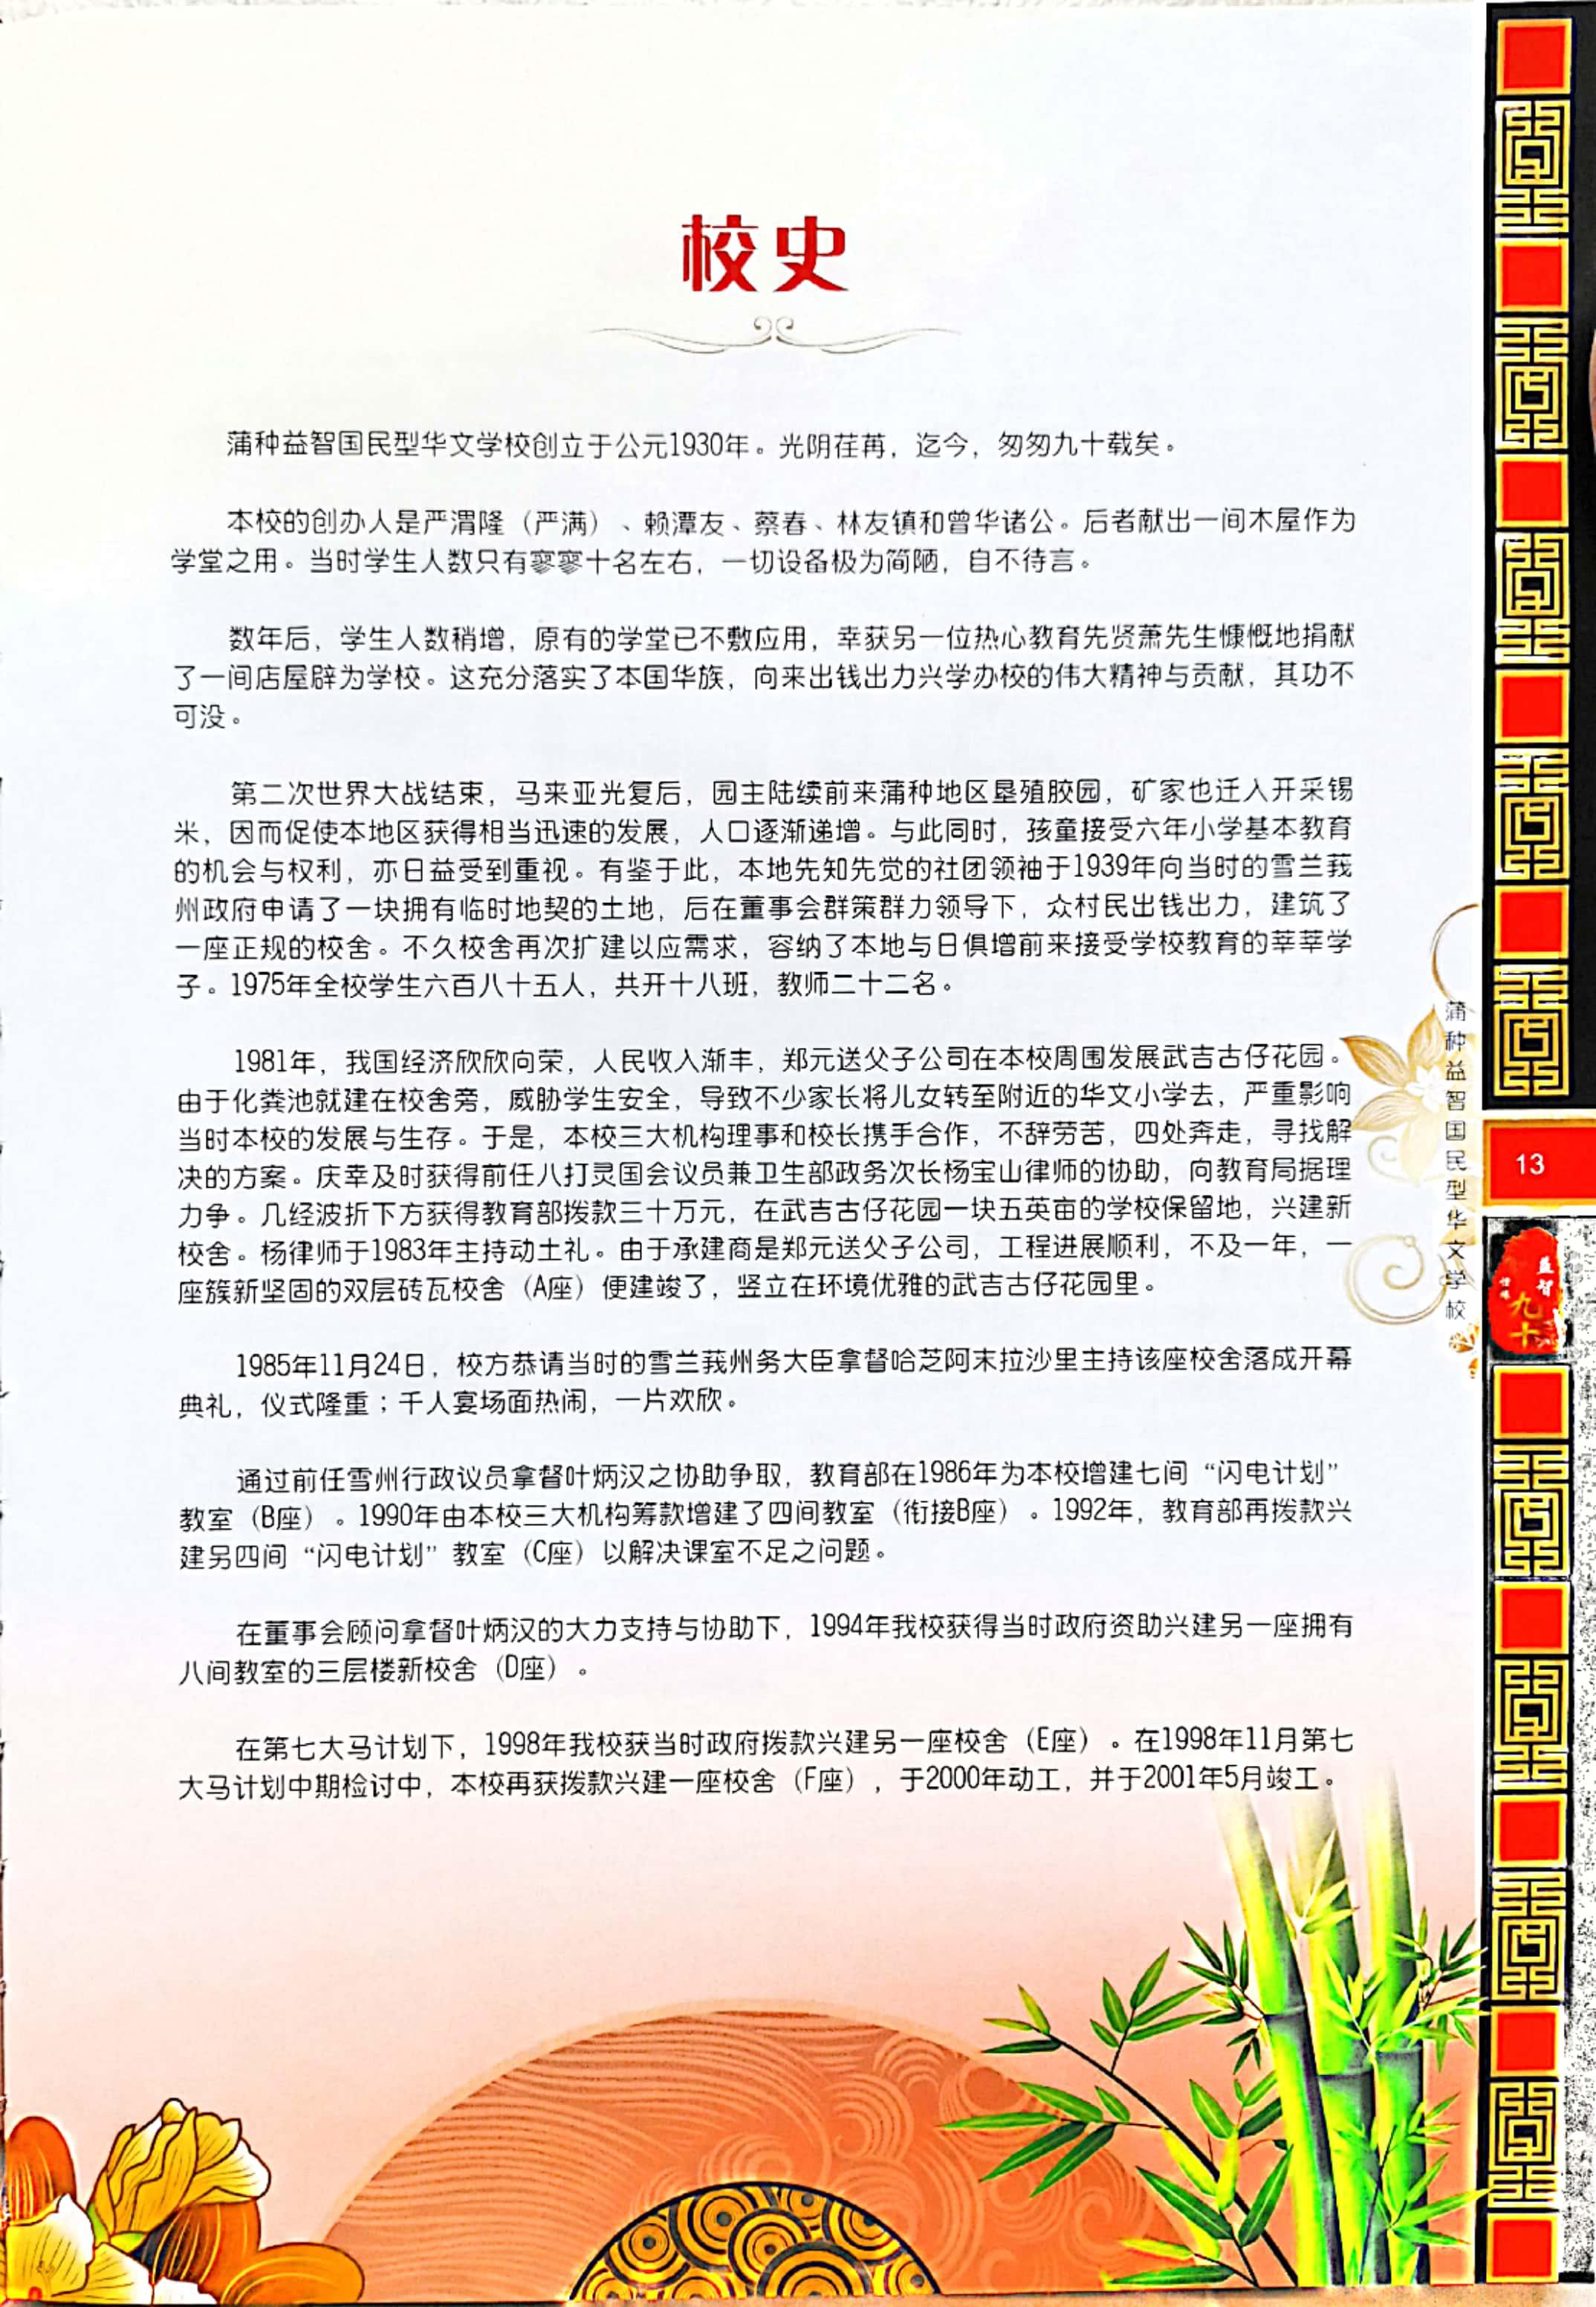 CamScanner 11-12-2020 10.46_4